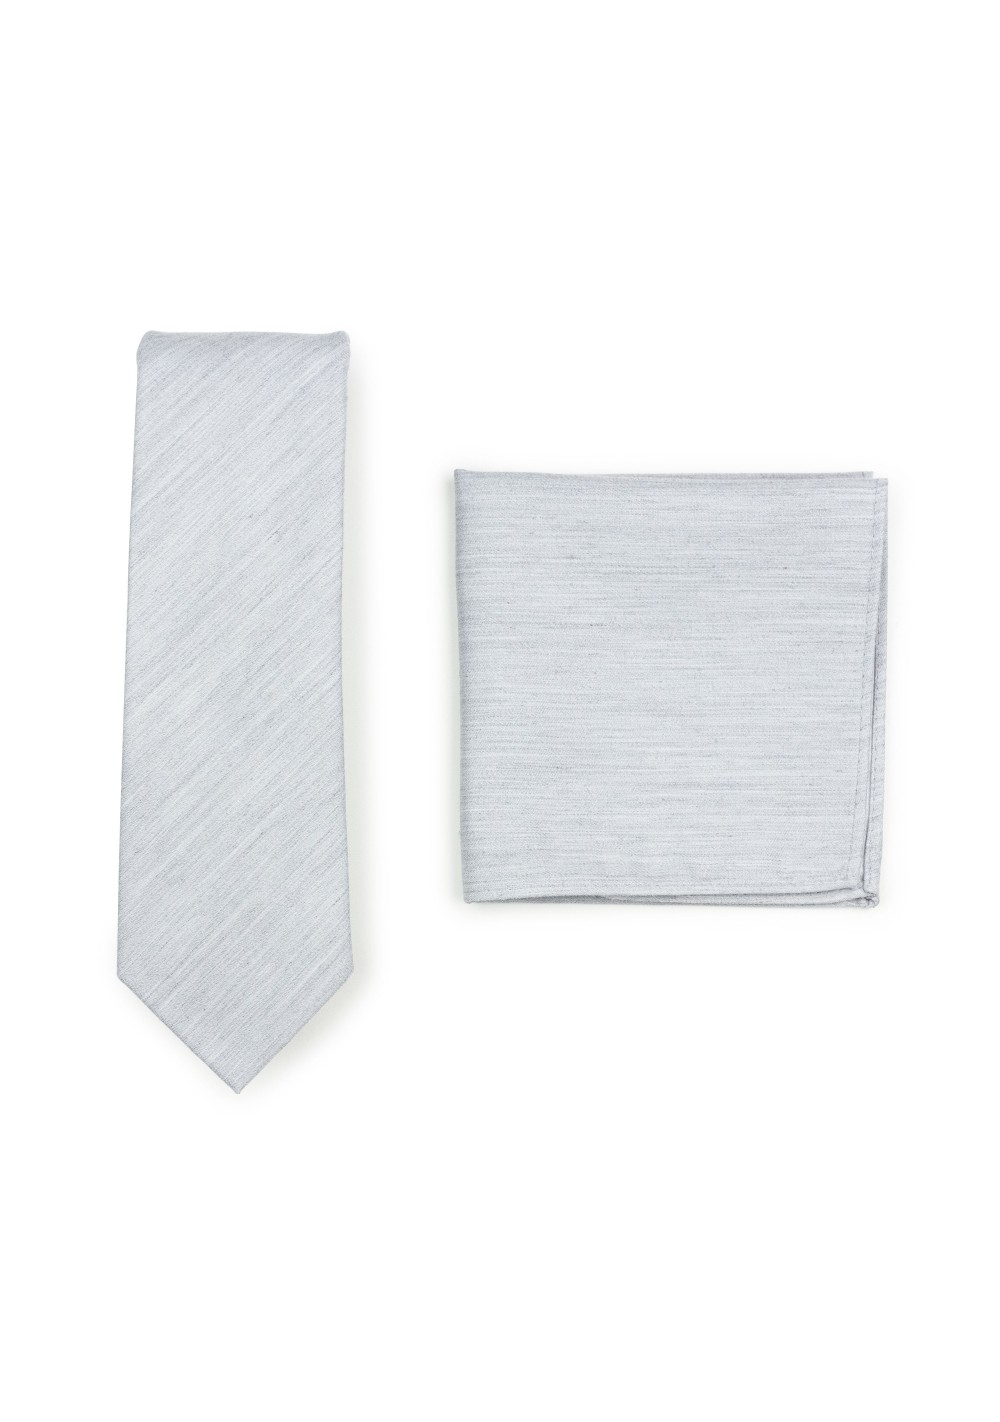 Skinny Tie and Hanky Set in Mystic Gray